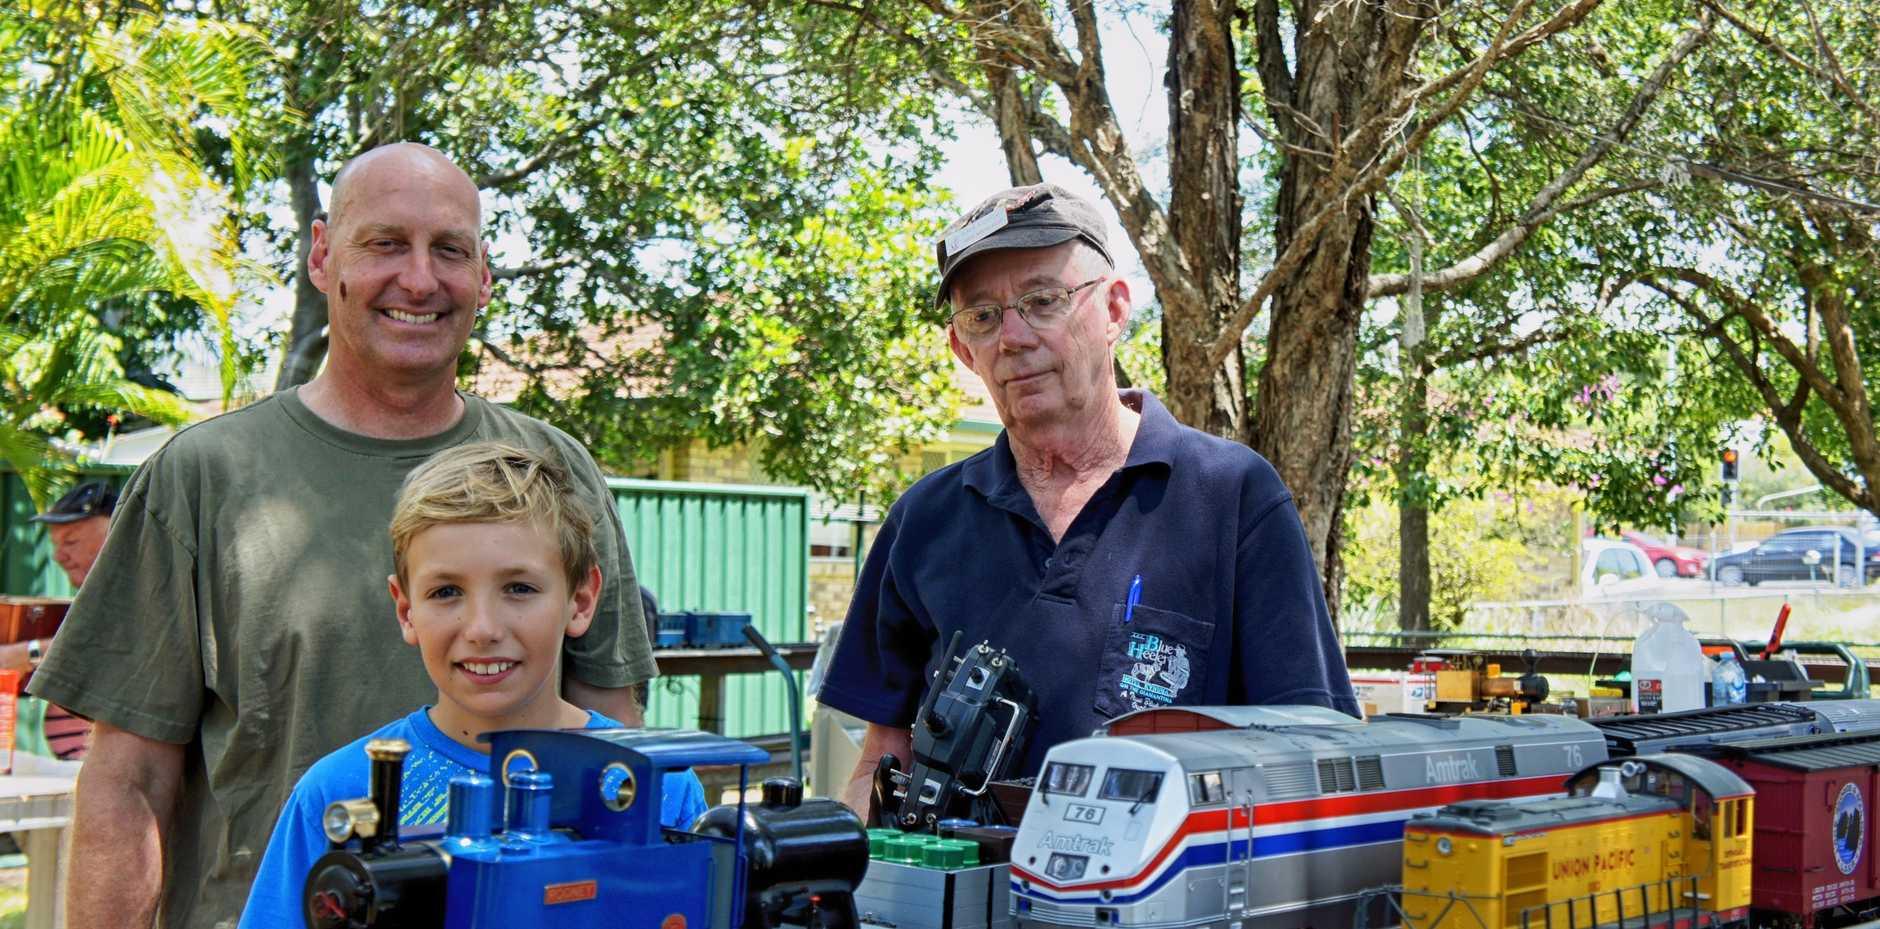 AMRA members Will Monroe, Alex Monroe and John Moorhead operating the garden G scale model trains.